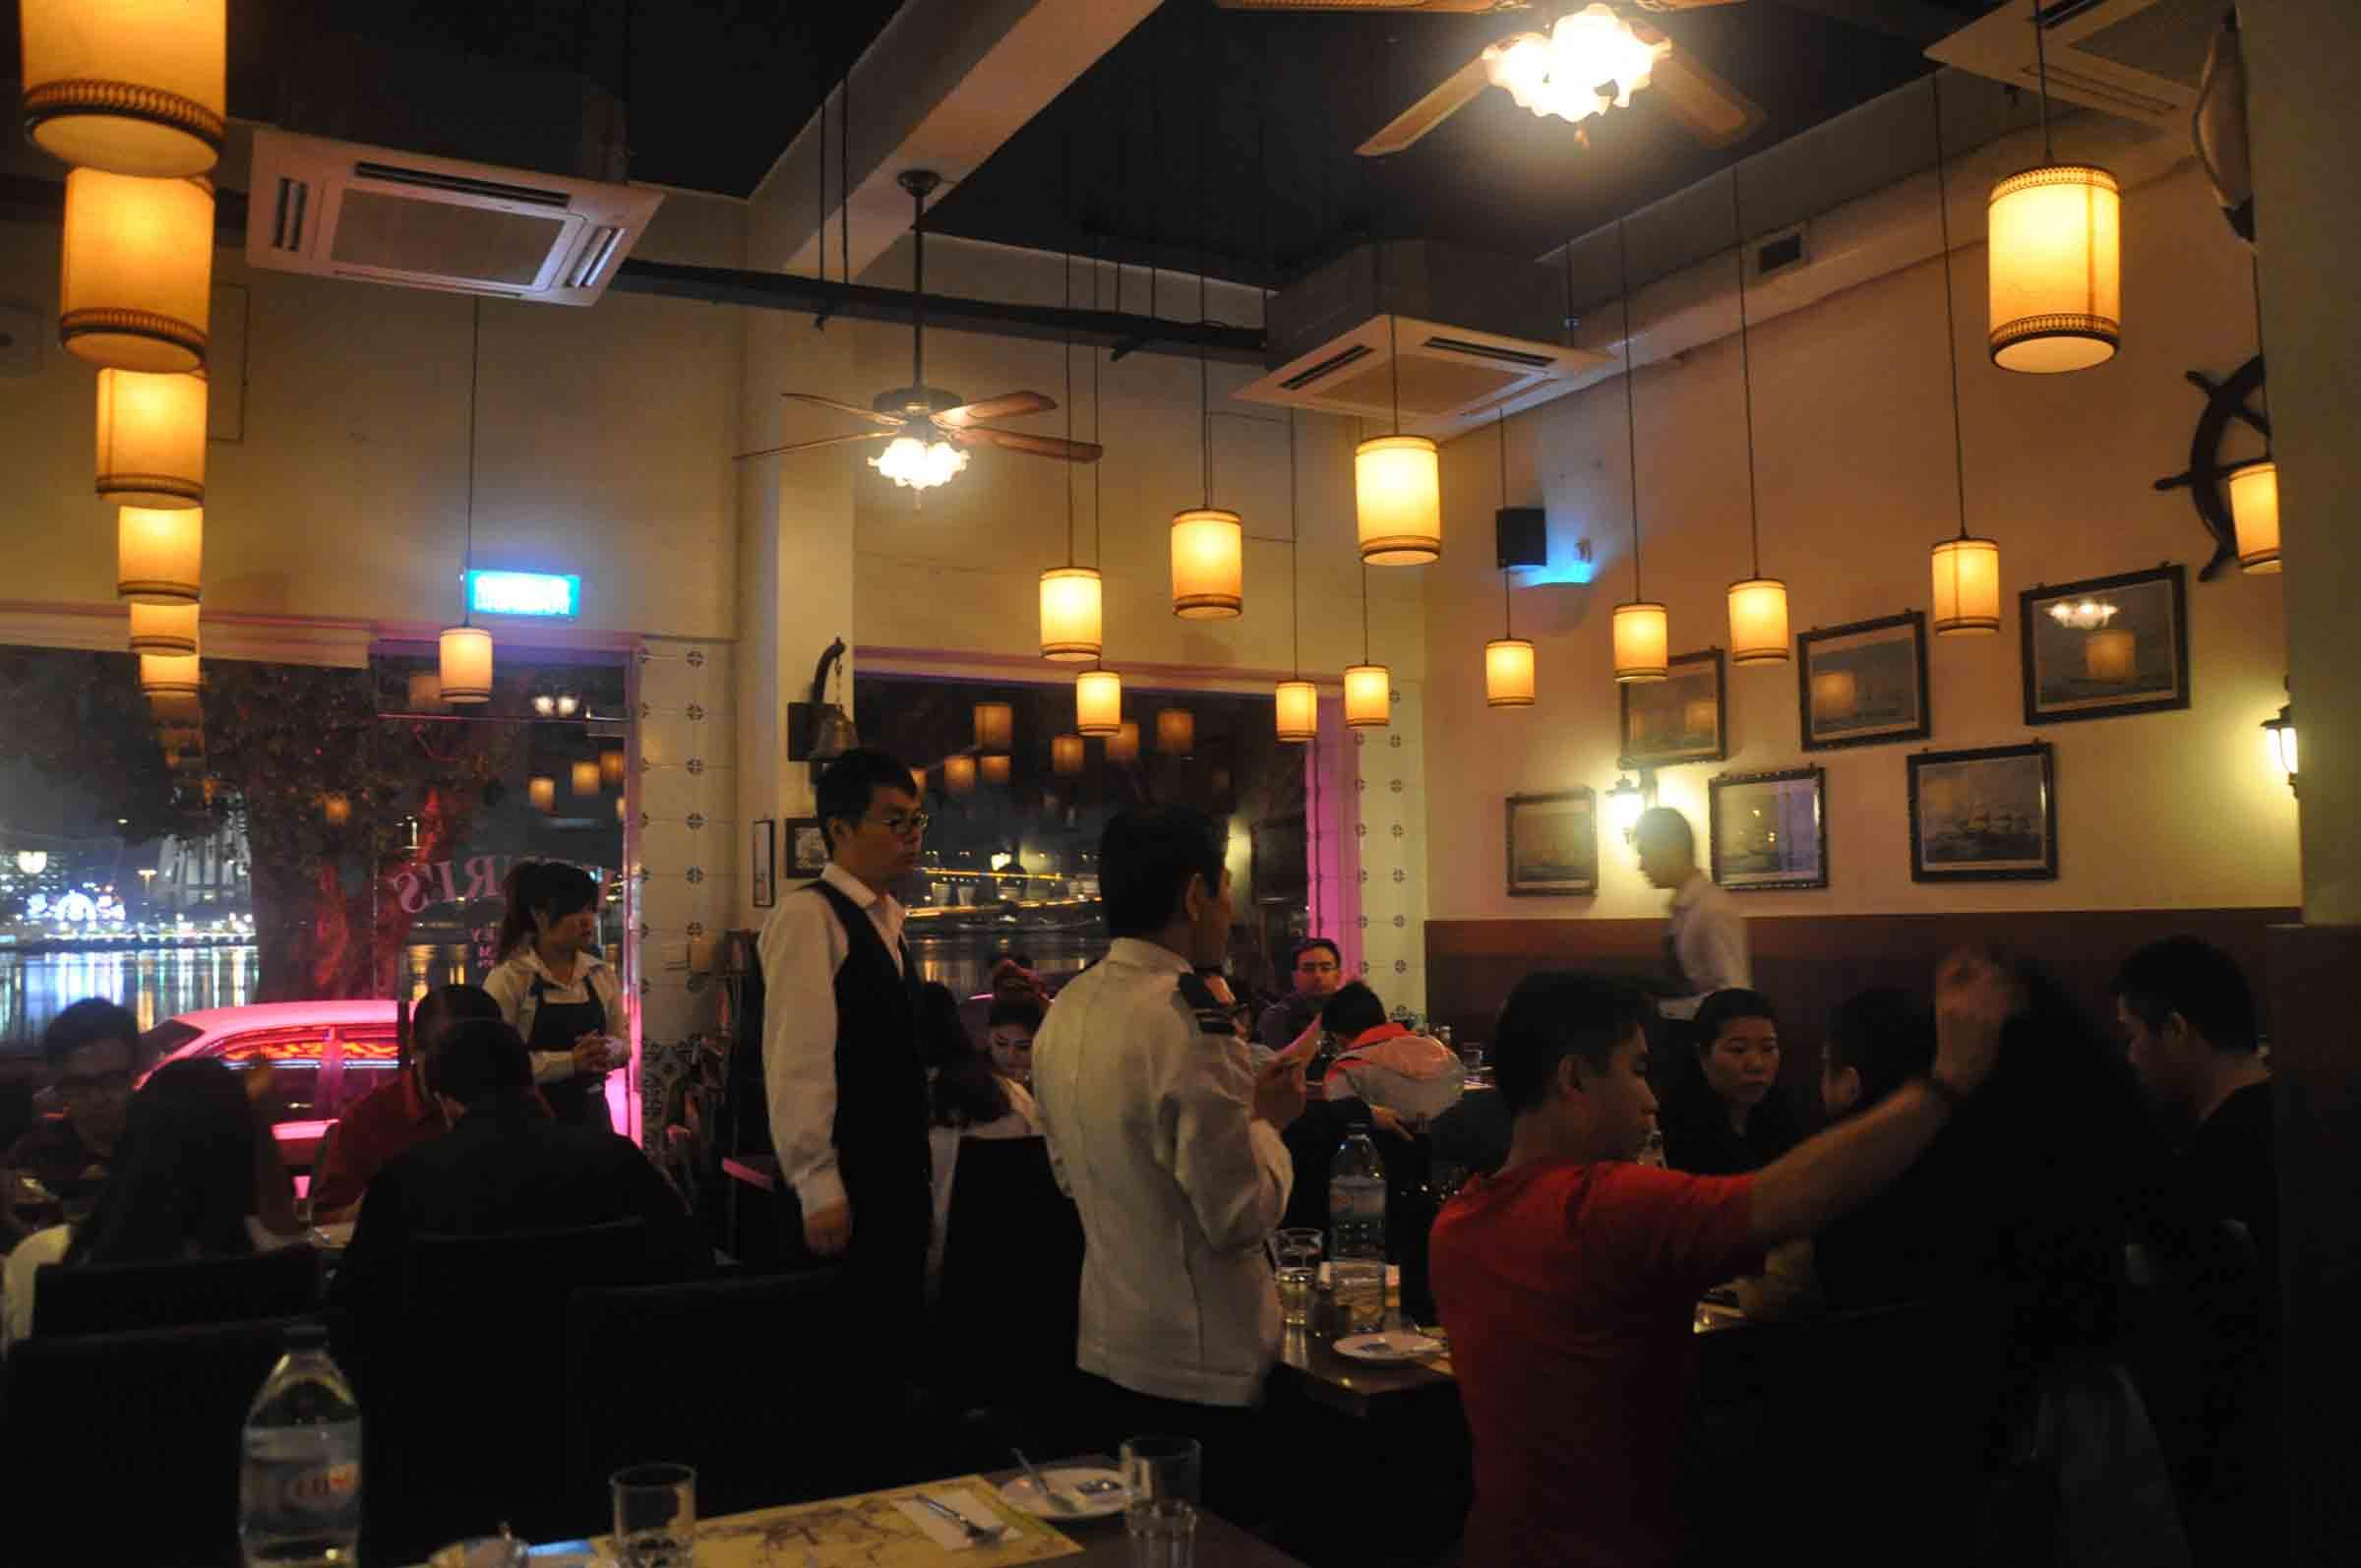 Best Macau restaurants: Henri's Galley Macau